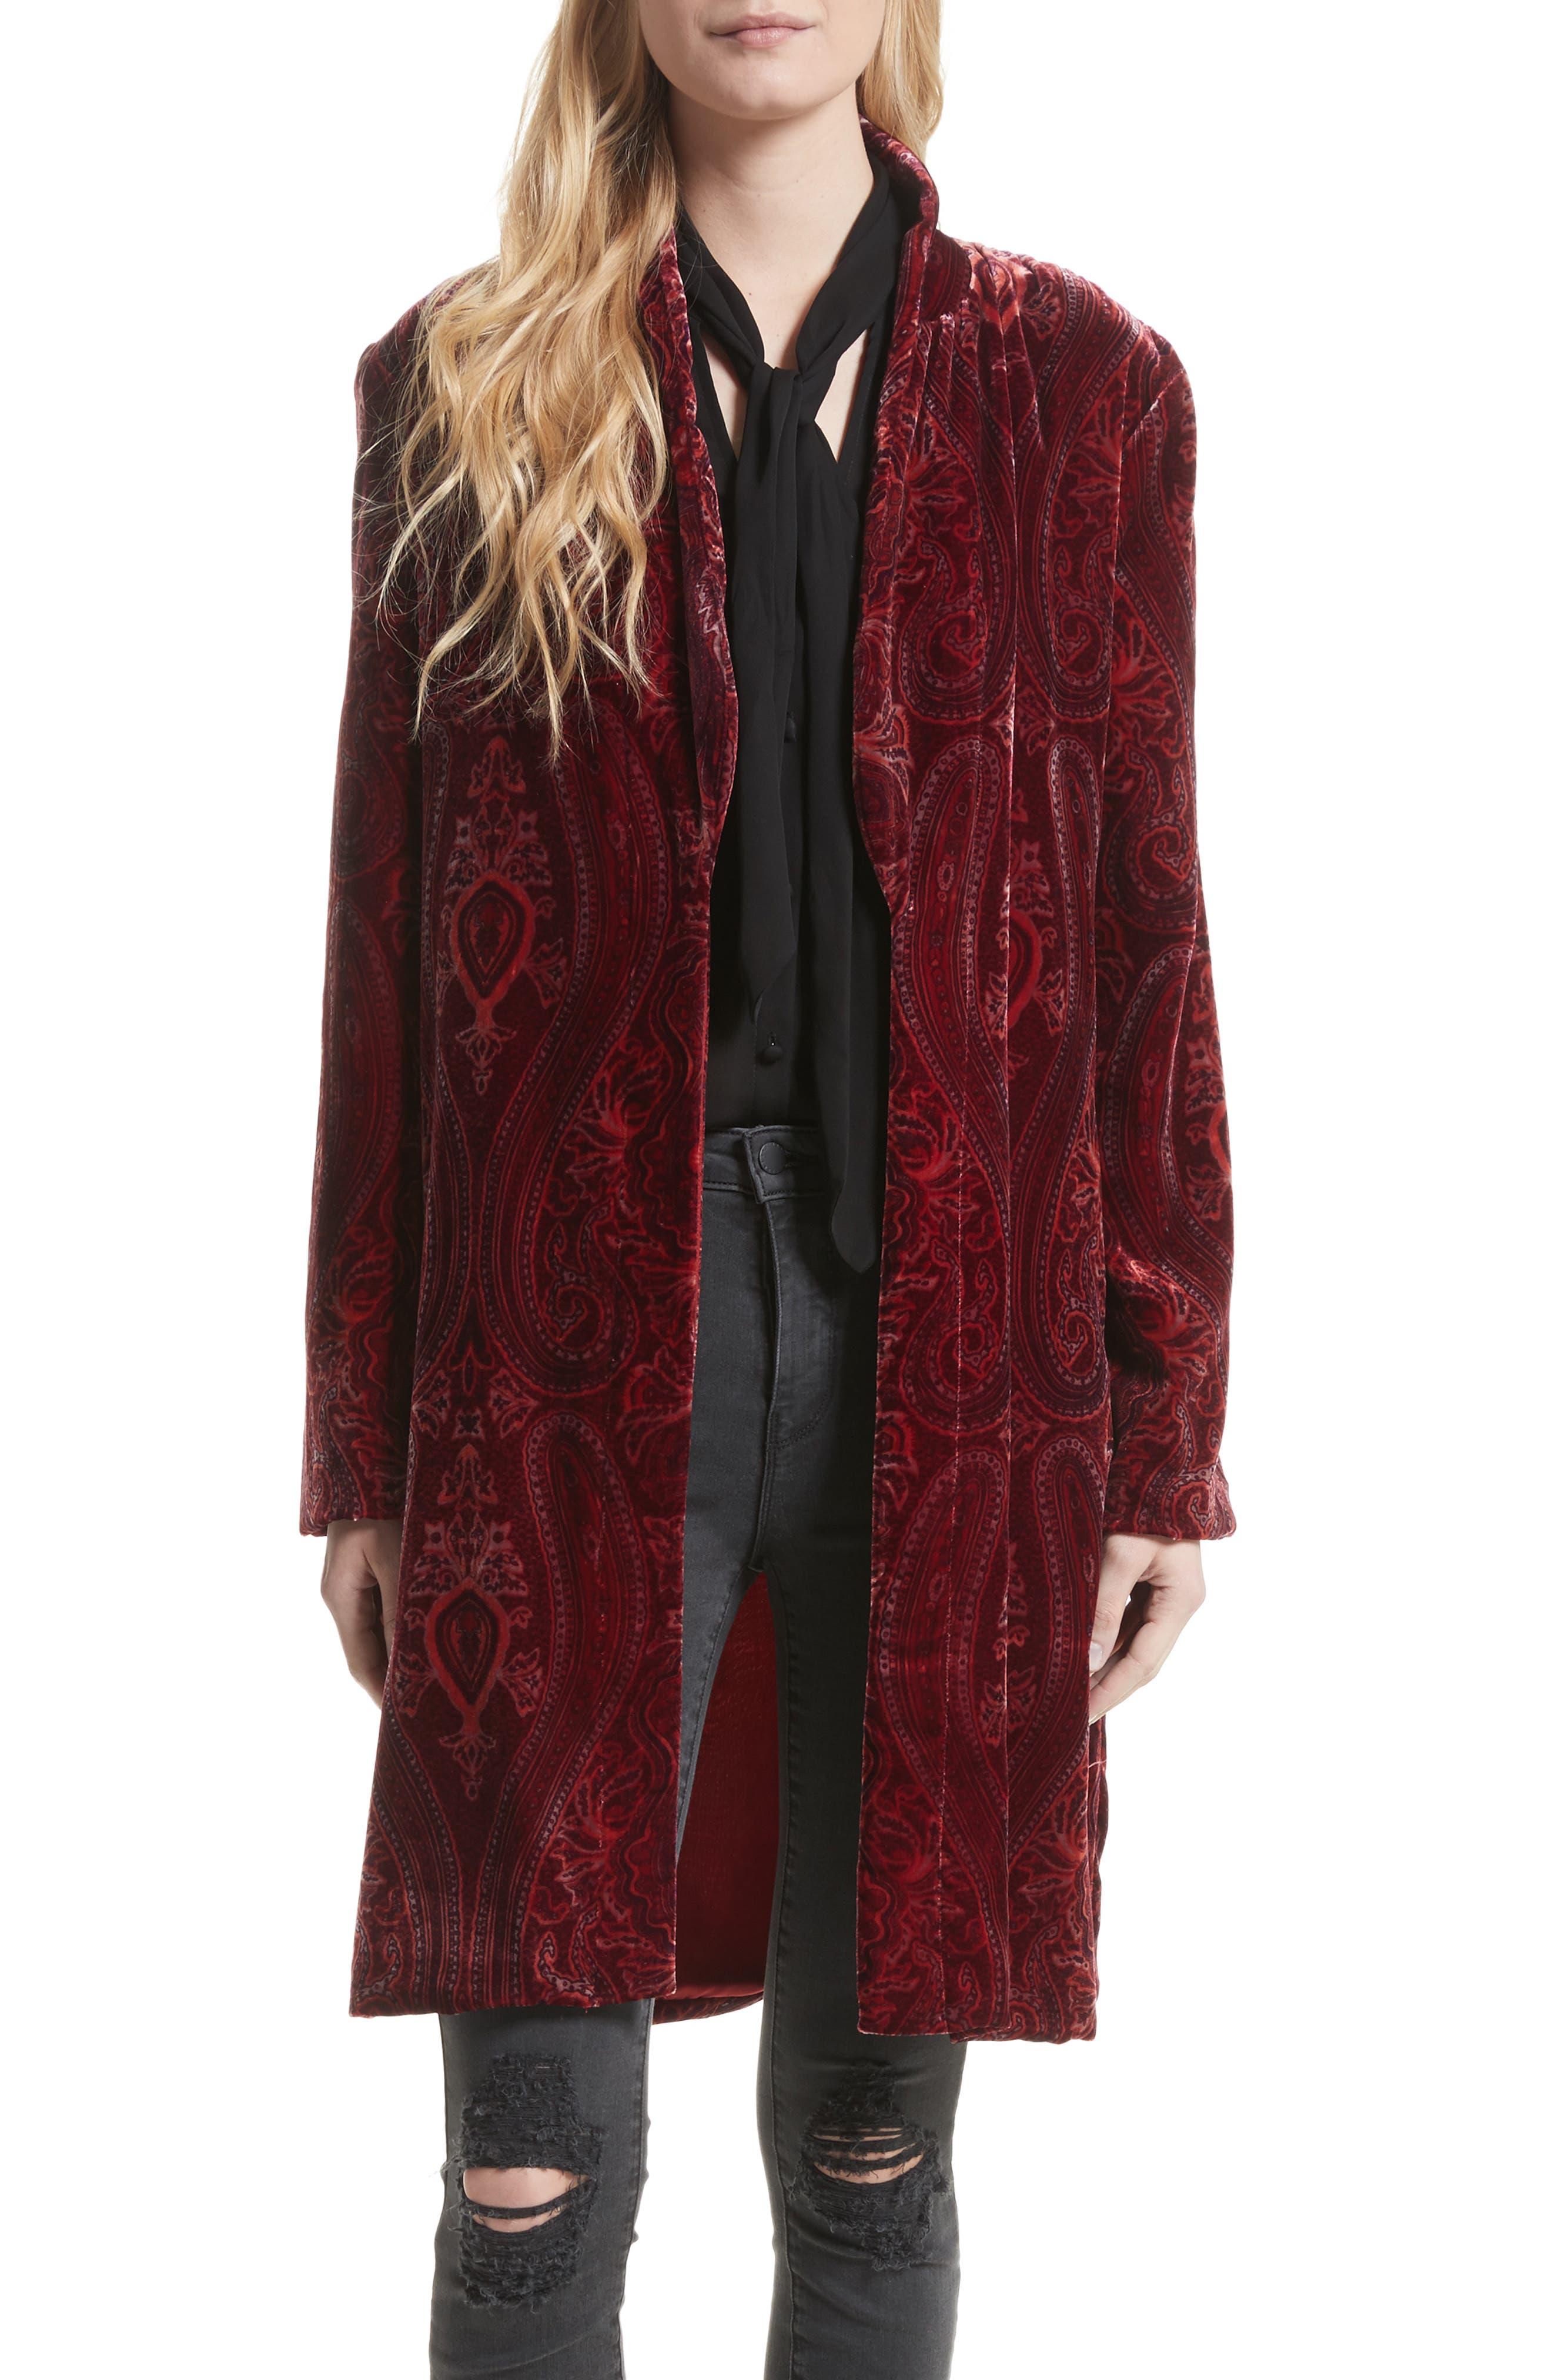 L'AGENCE Cressida Velvet Robe Jacket